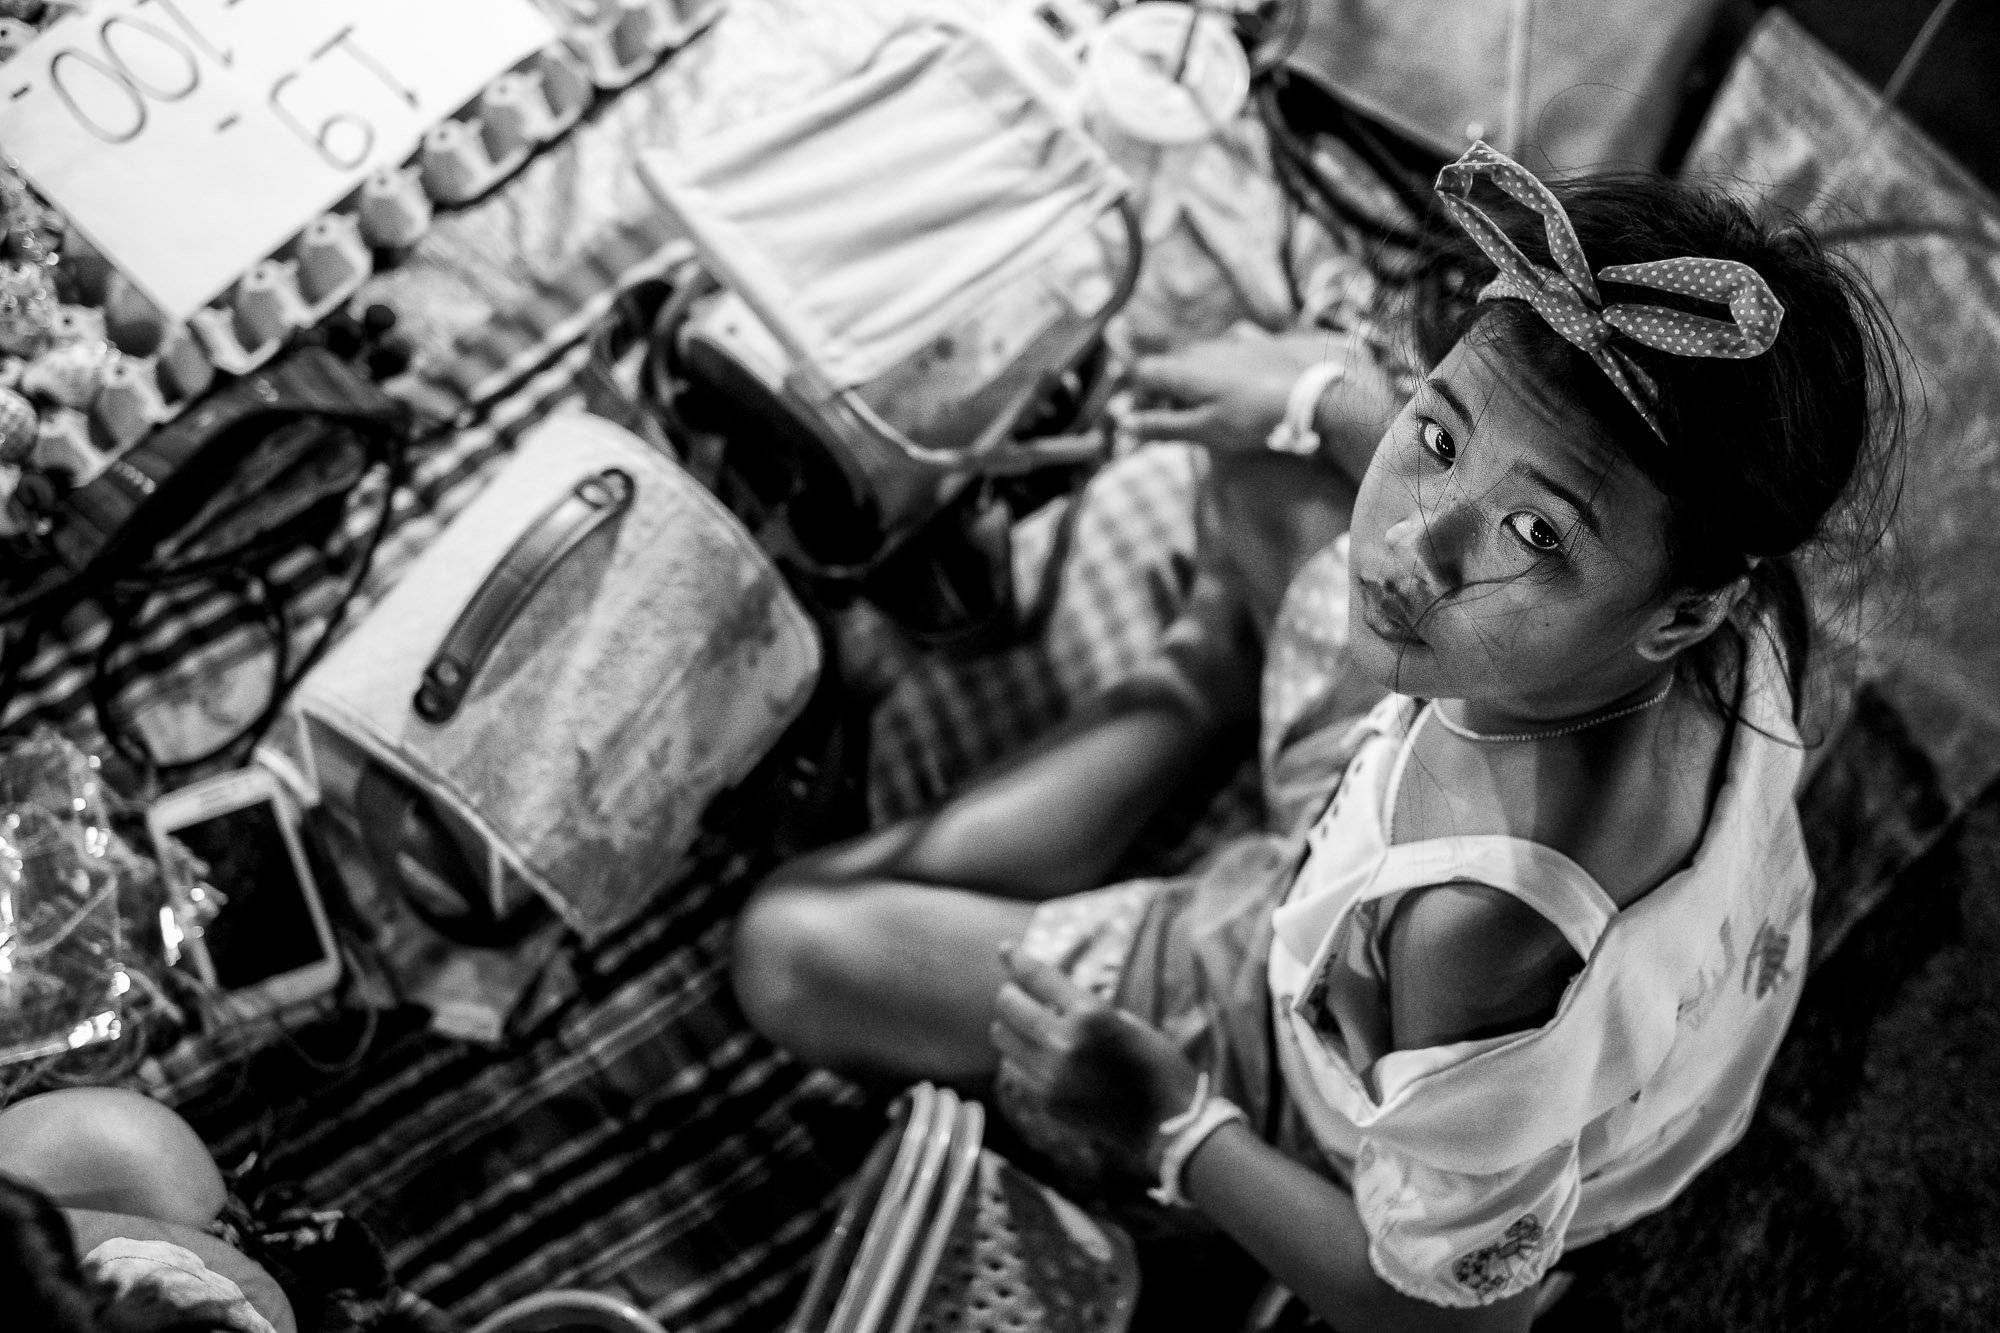 CHIANG MAI thailand asia street photography portrait kid girl market